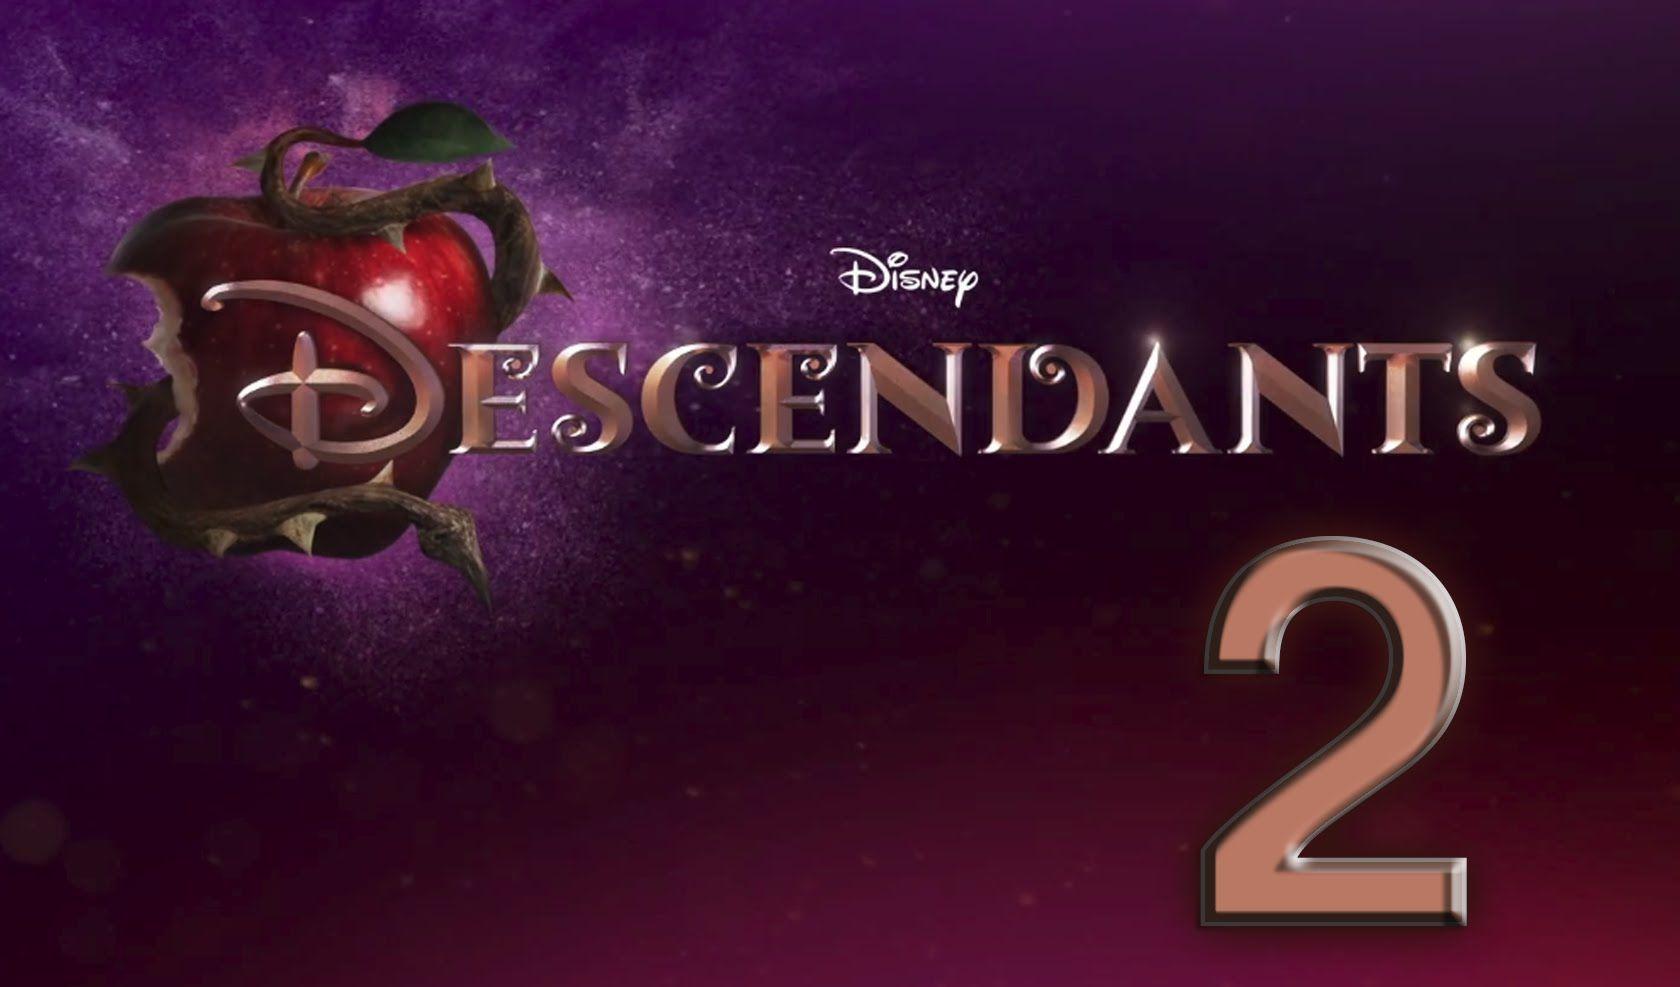 Descendants 2 Logo wallpaper HD 2016 in Movies